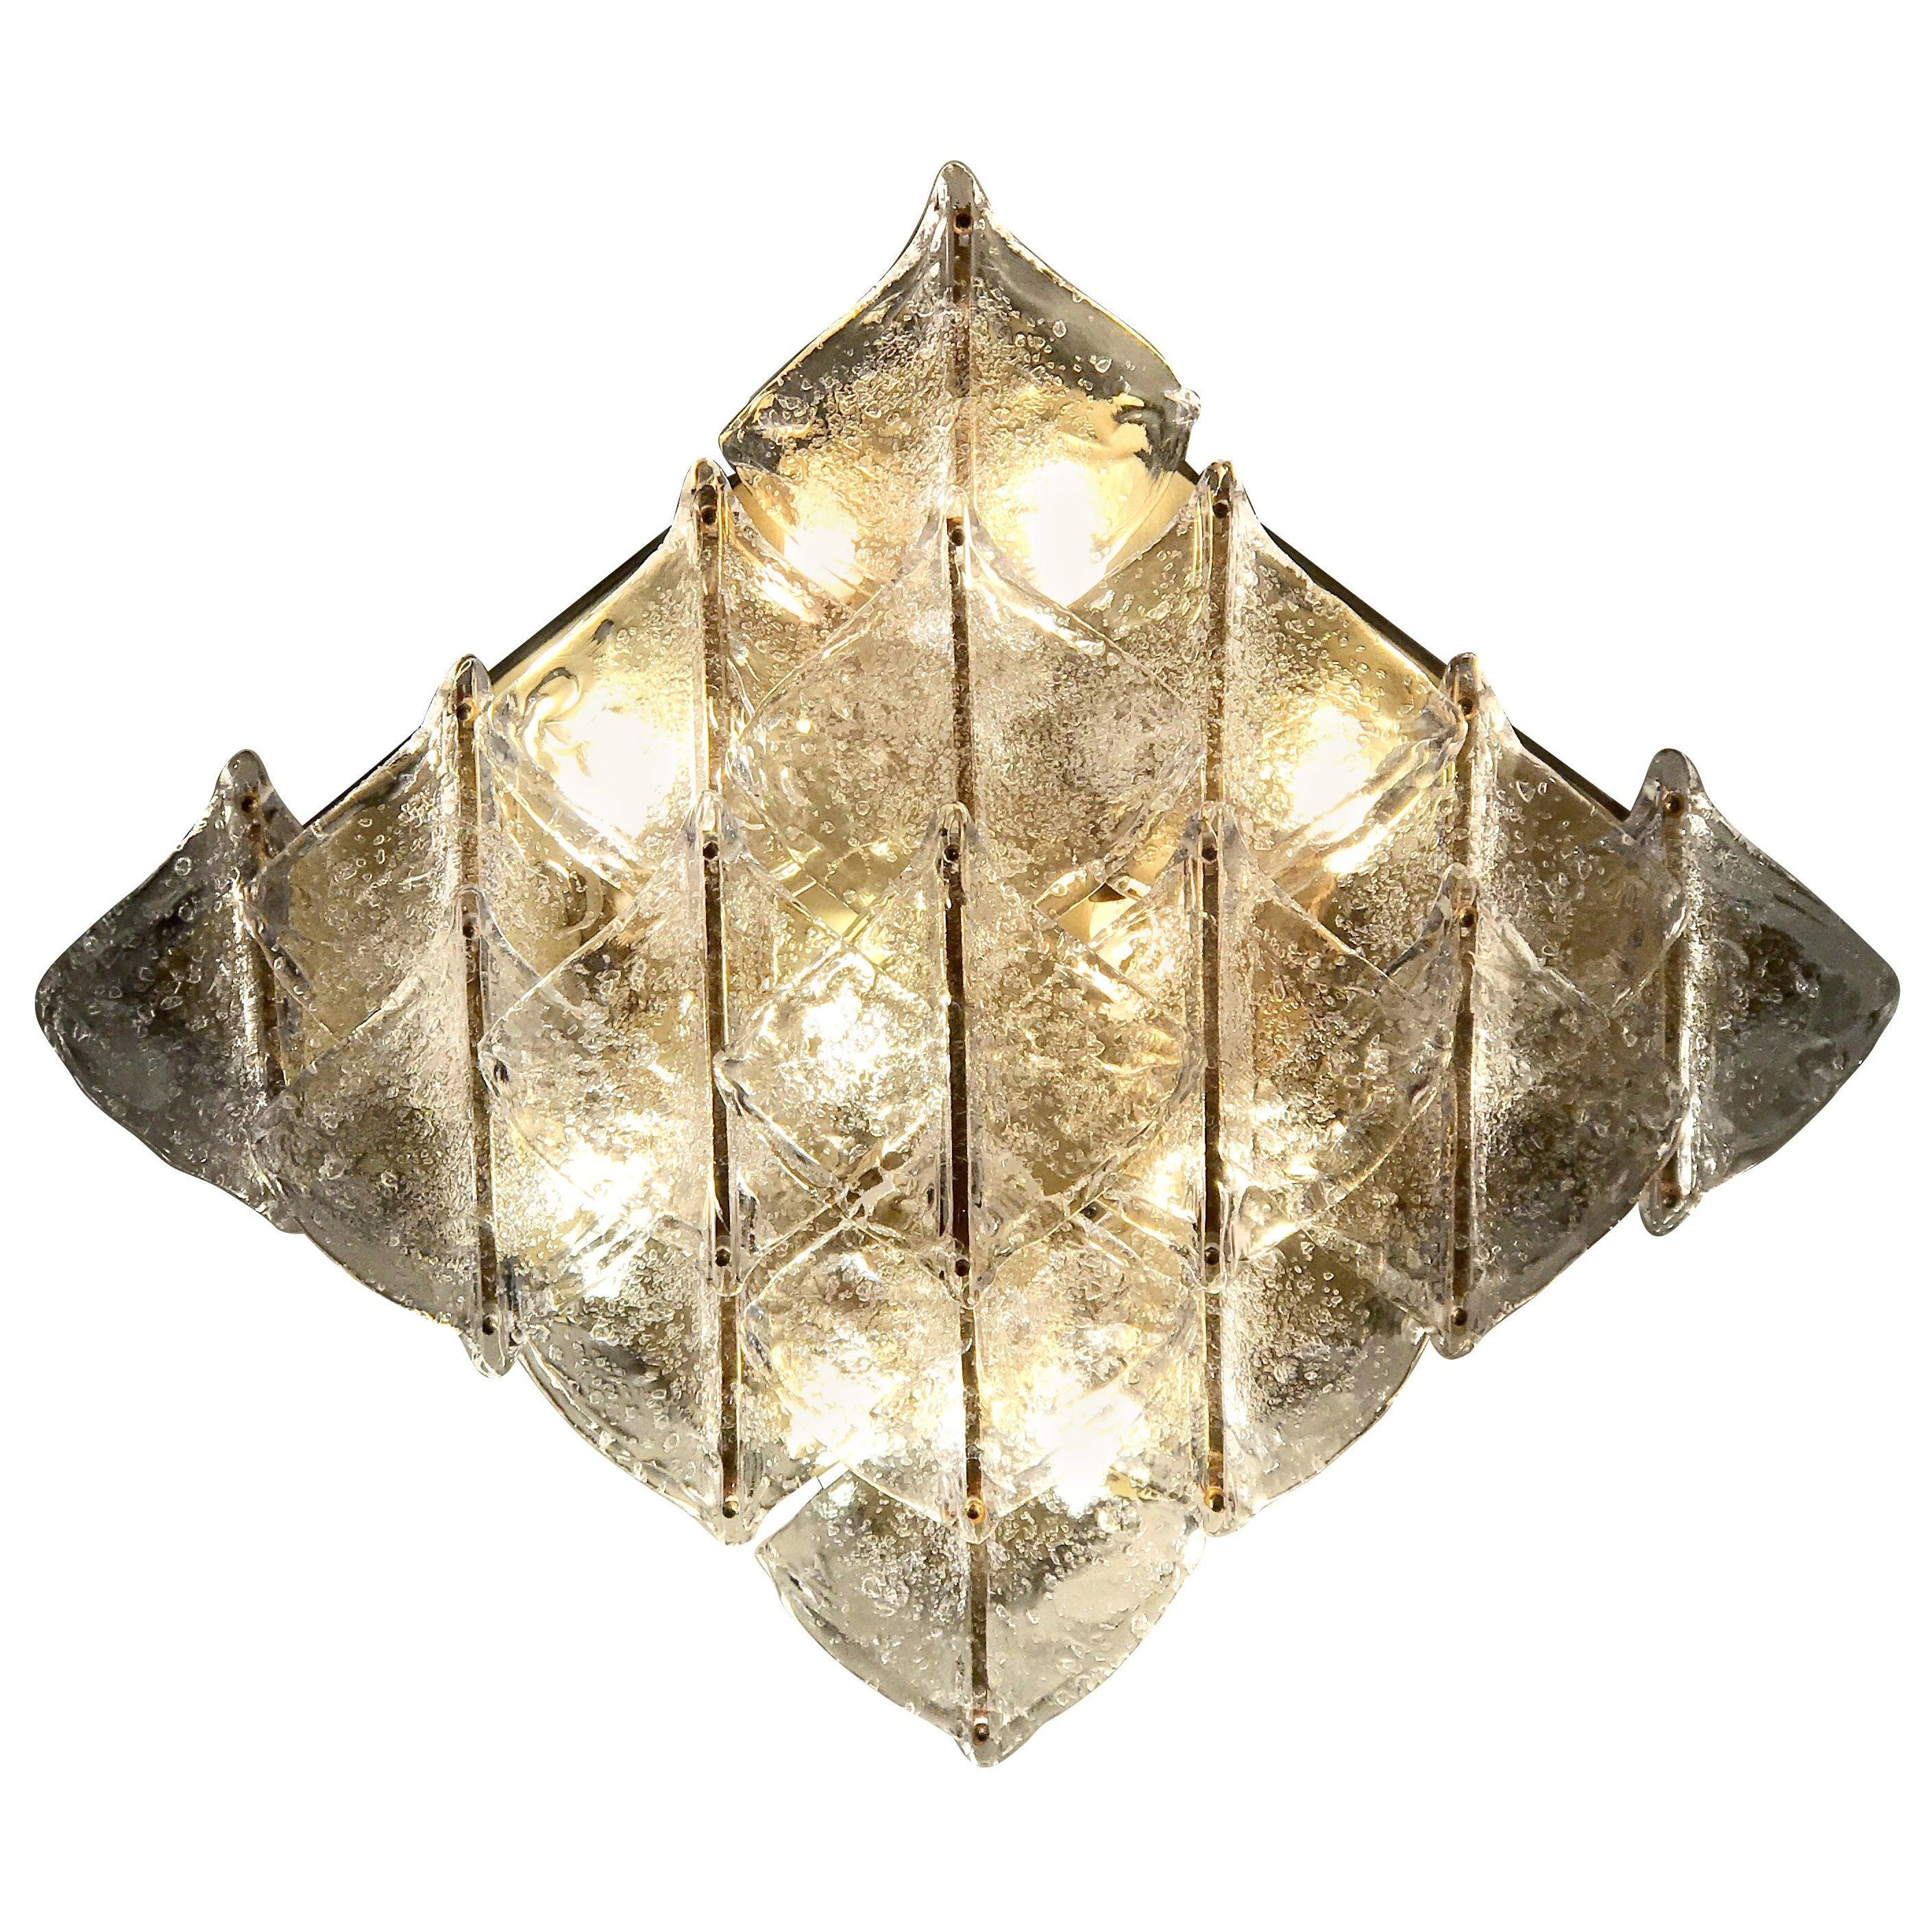 Rare Italian Murano Glass Flushmount or Wall Light by Mazzega